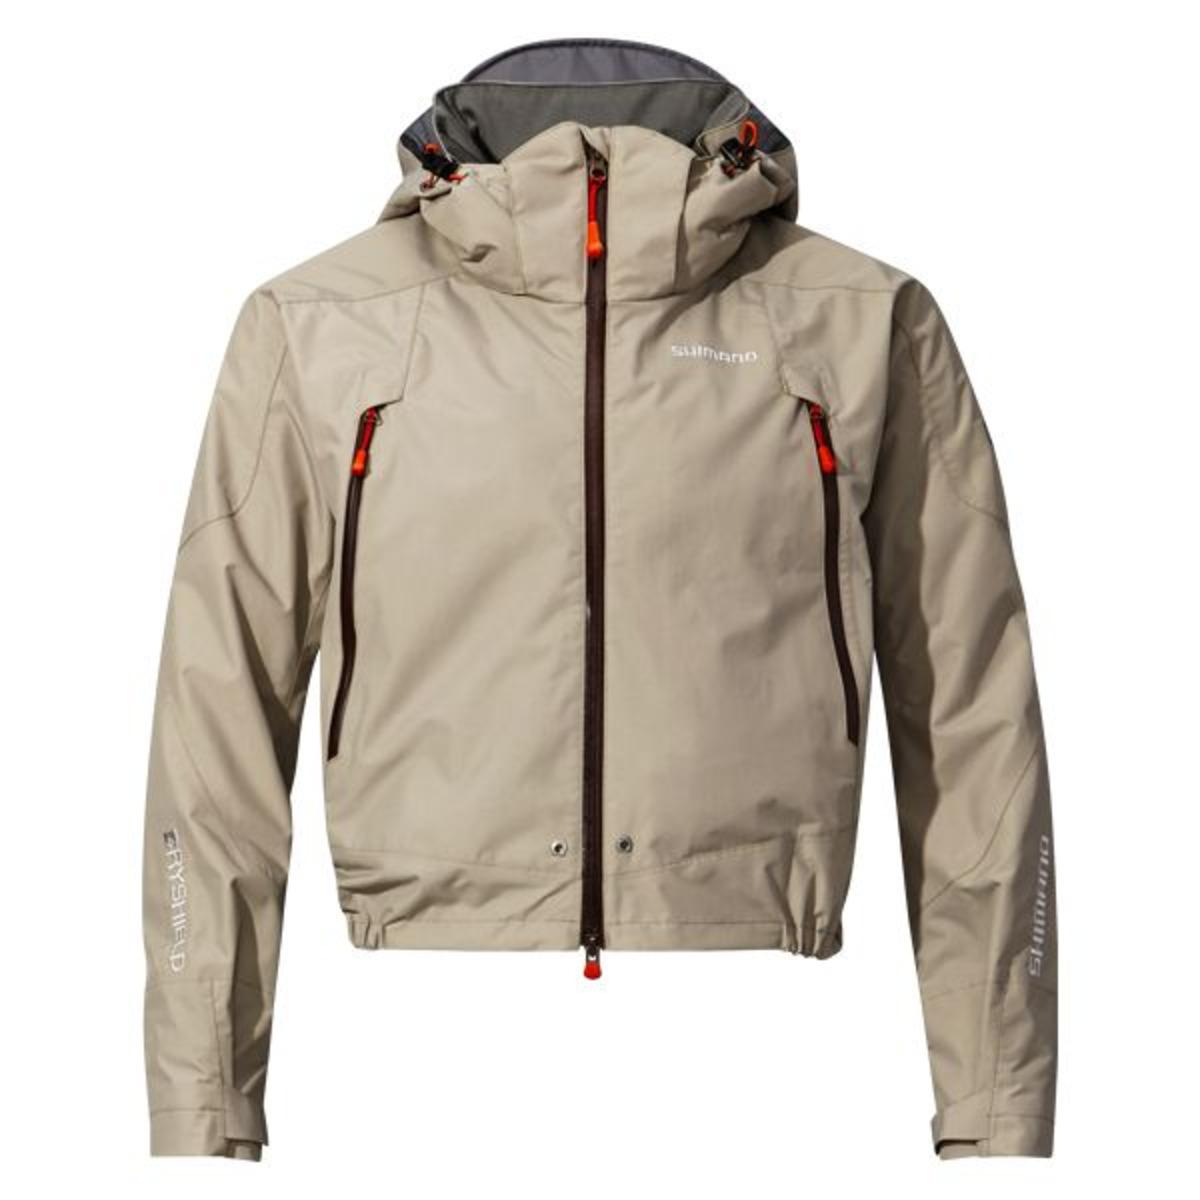 Shimano Jacke Dryshield Advance Short Rain - XL - Beige